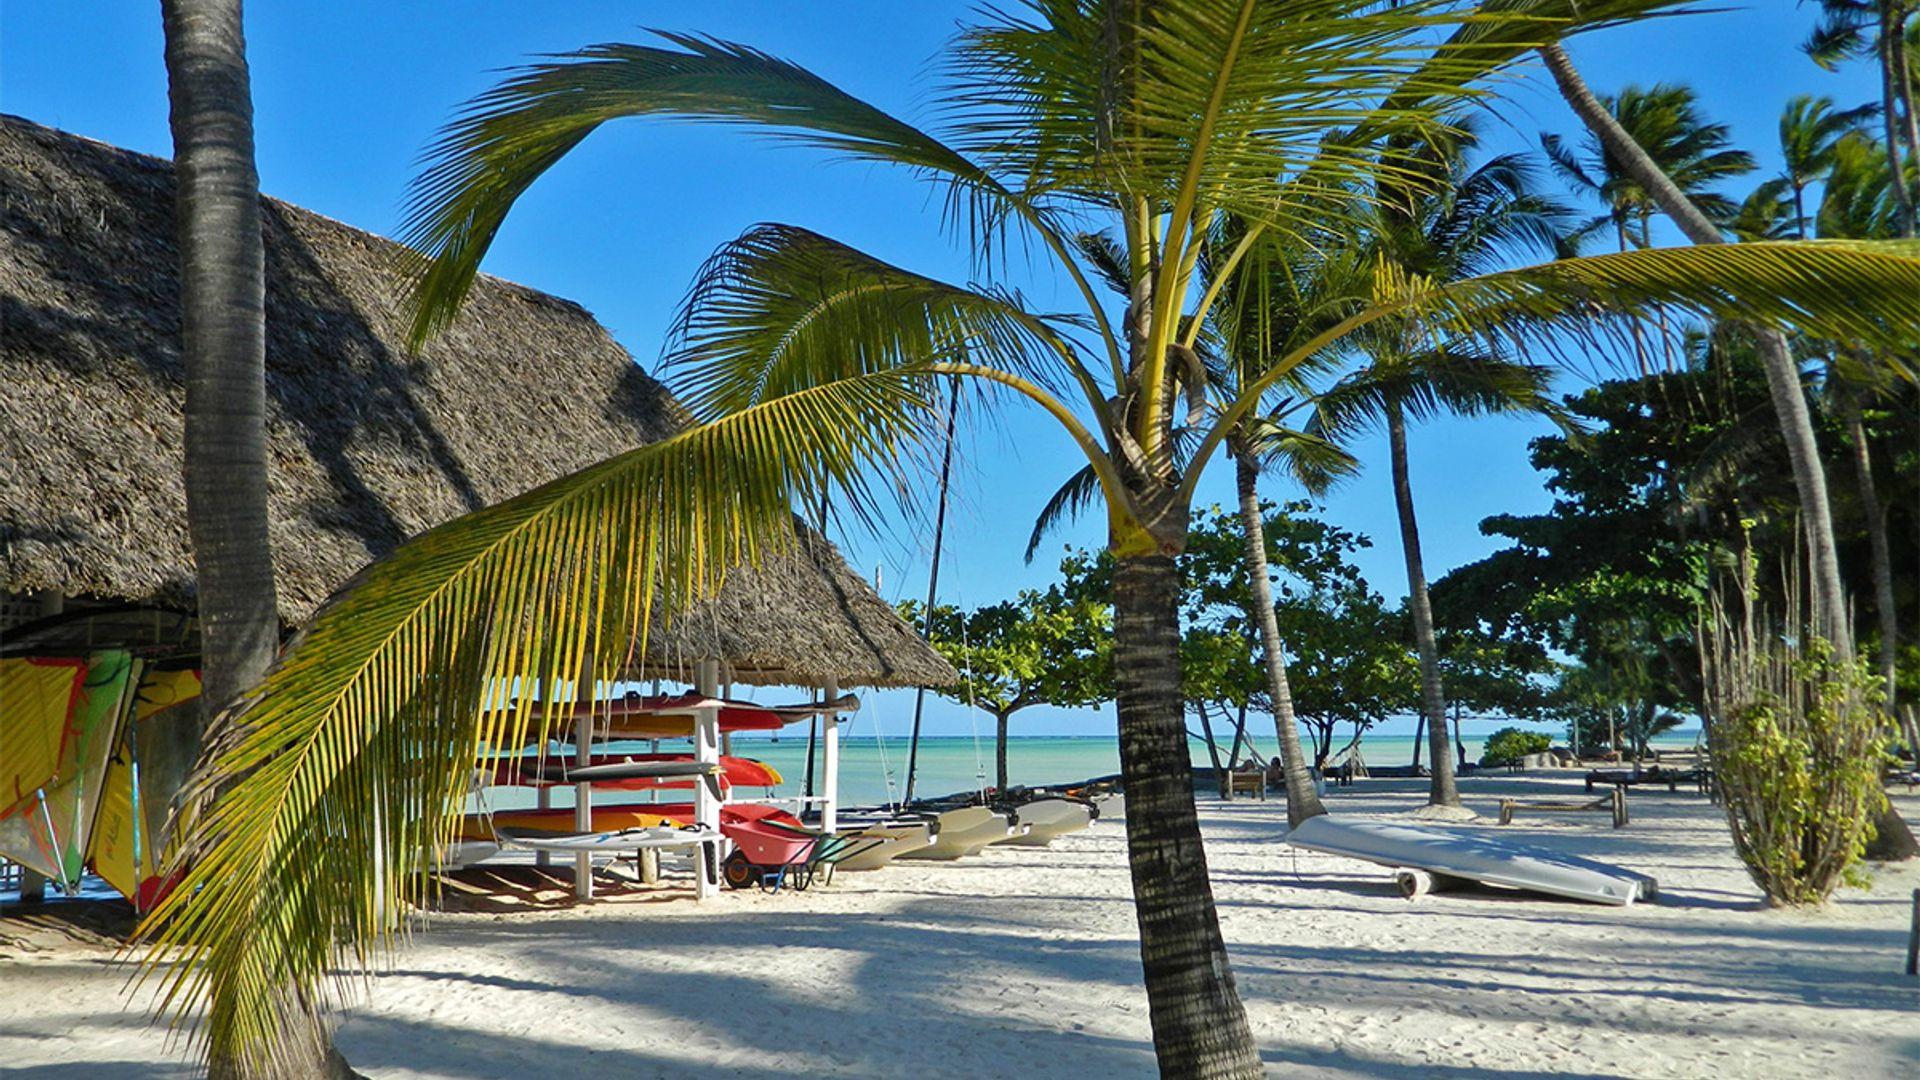 Sejur plaja Zanzibar, Tanzania - 28 Noiembrie 2021